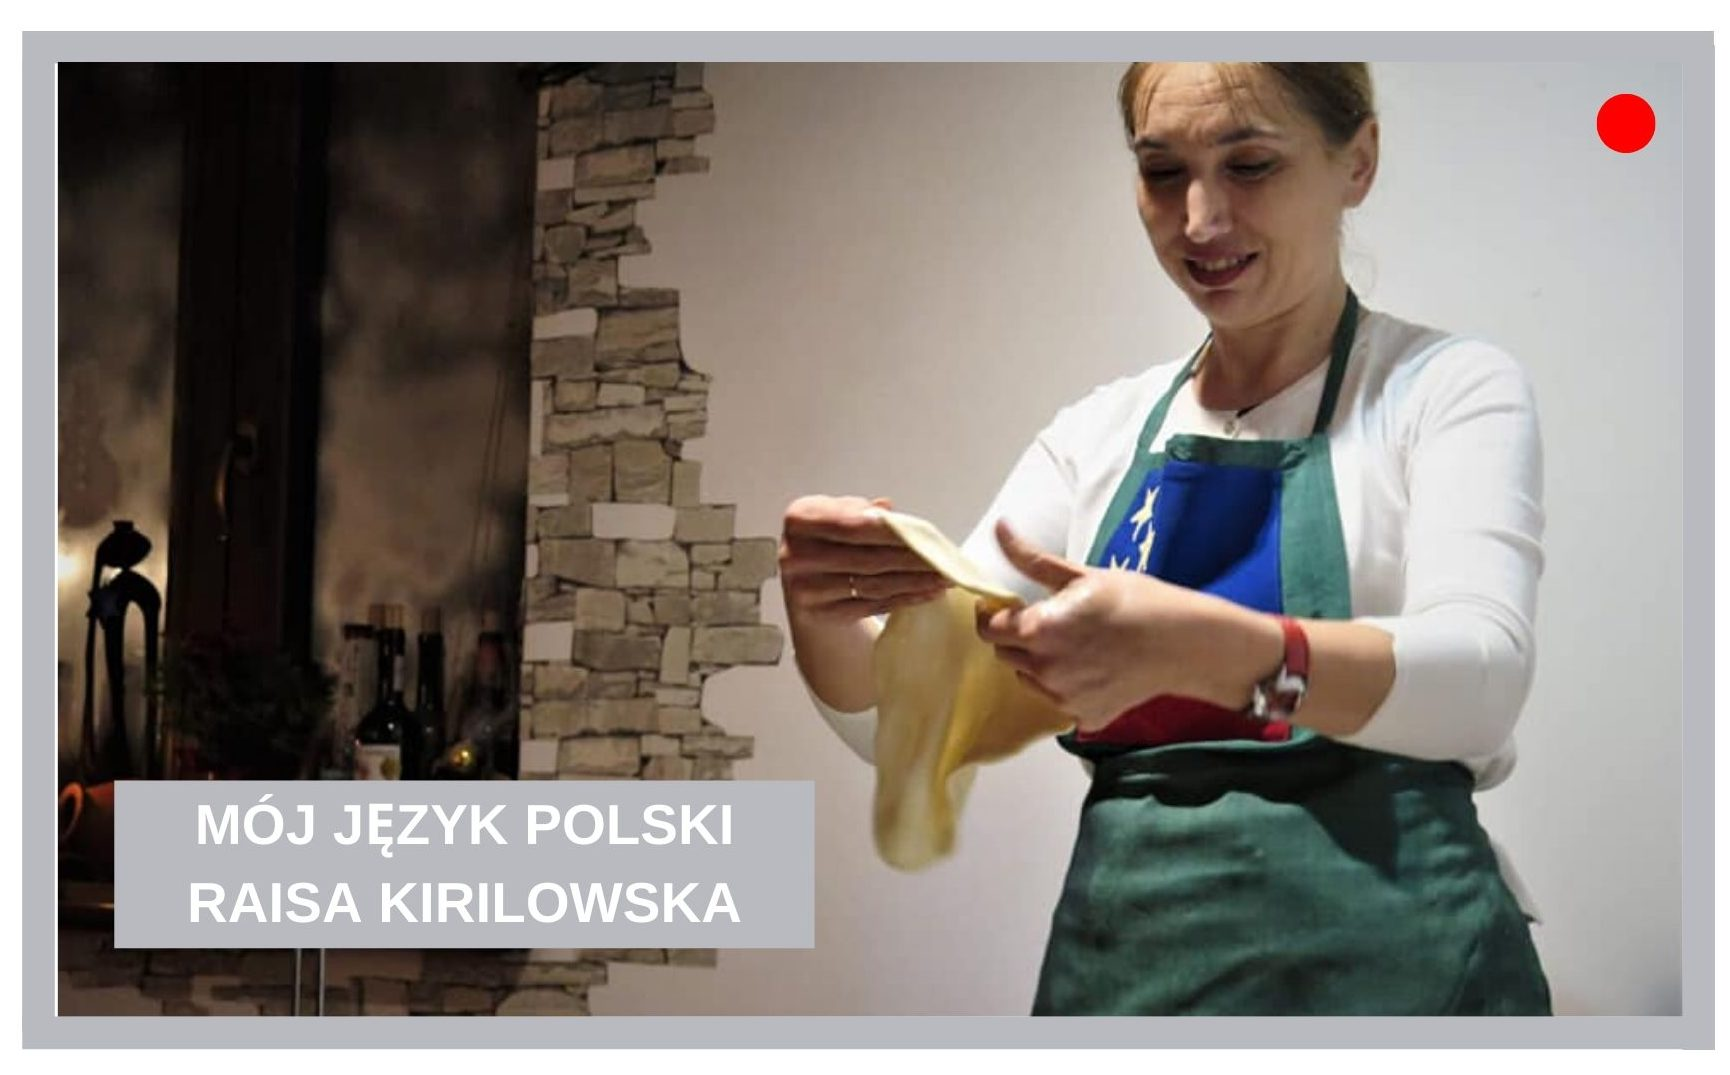 MÓJ JĘZYK POLSKI – RAISA KIRILOWSKA